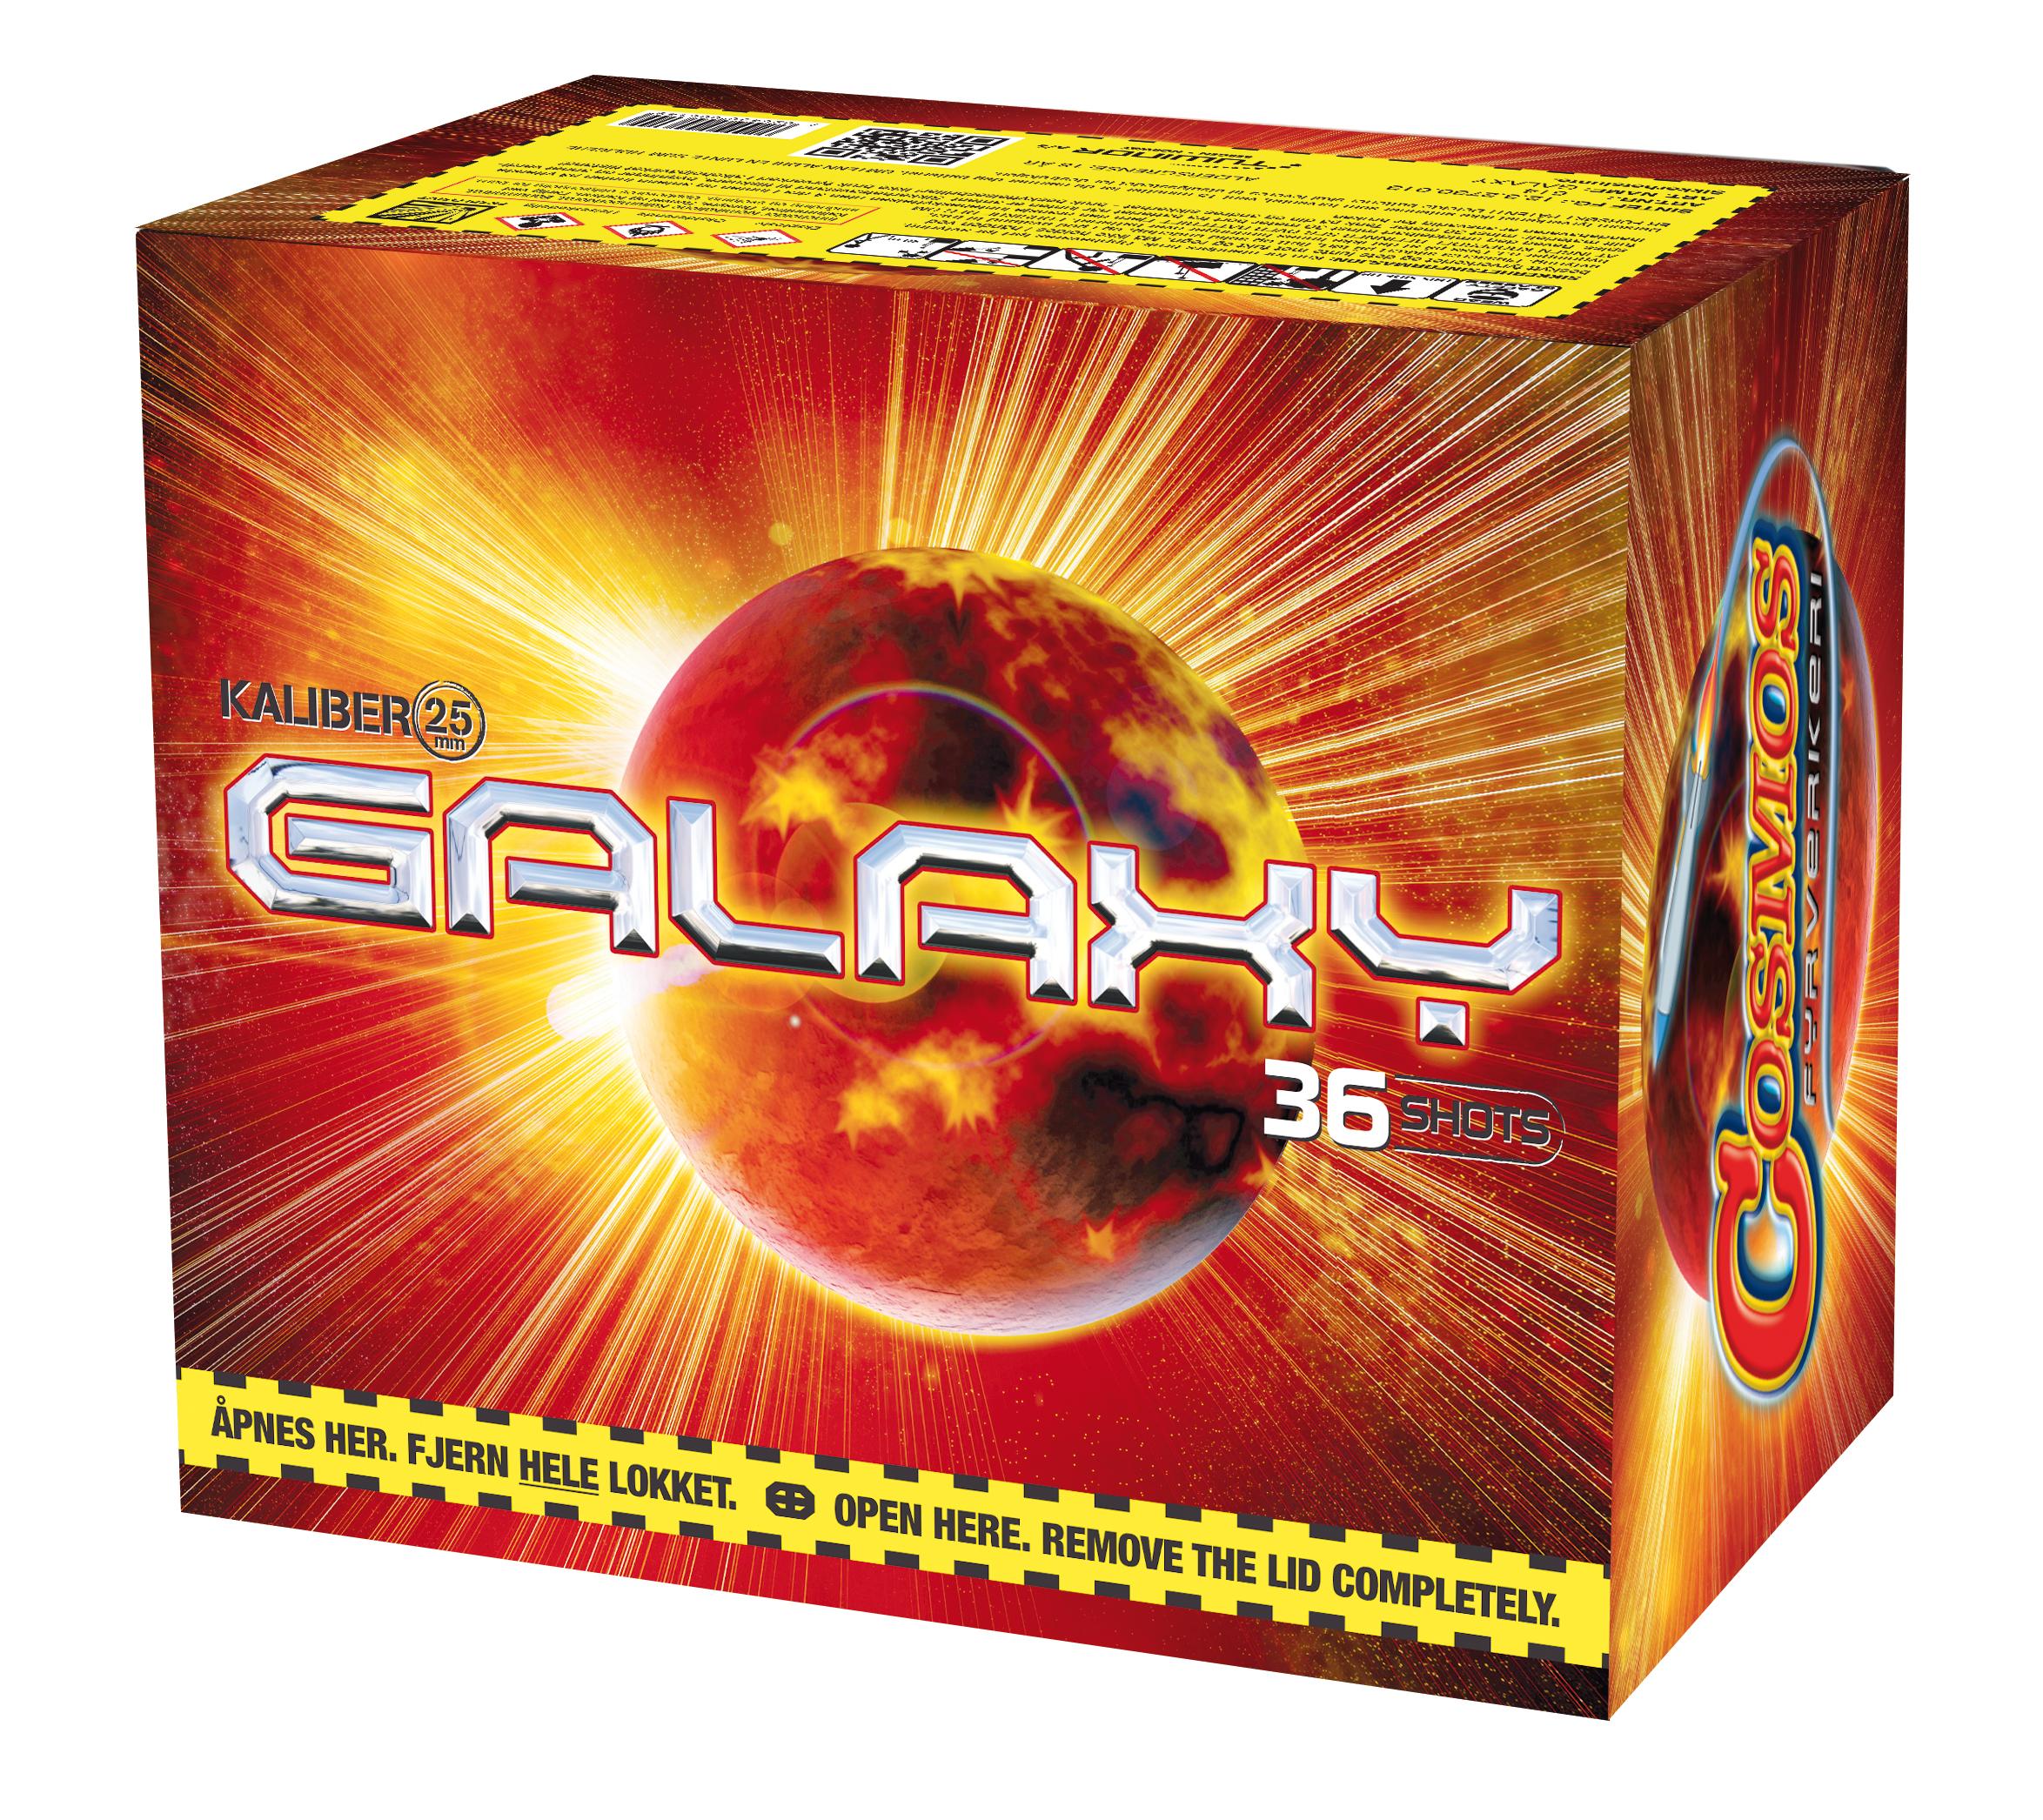 614-galaxy kopi